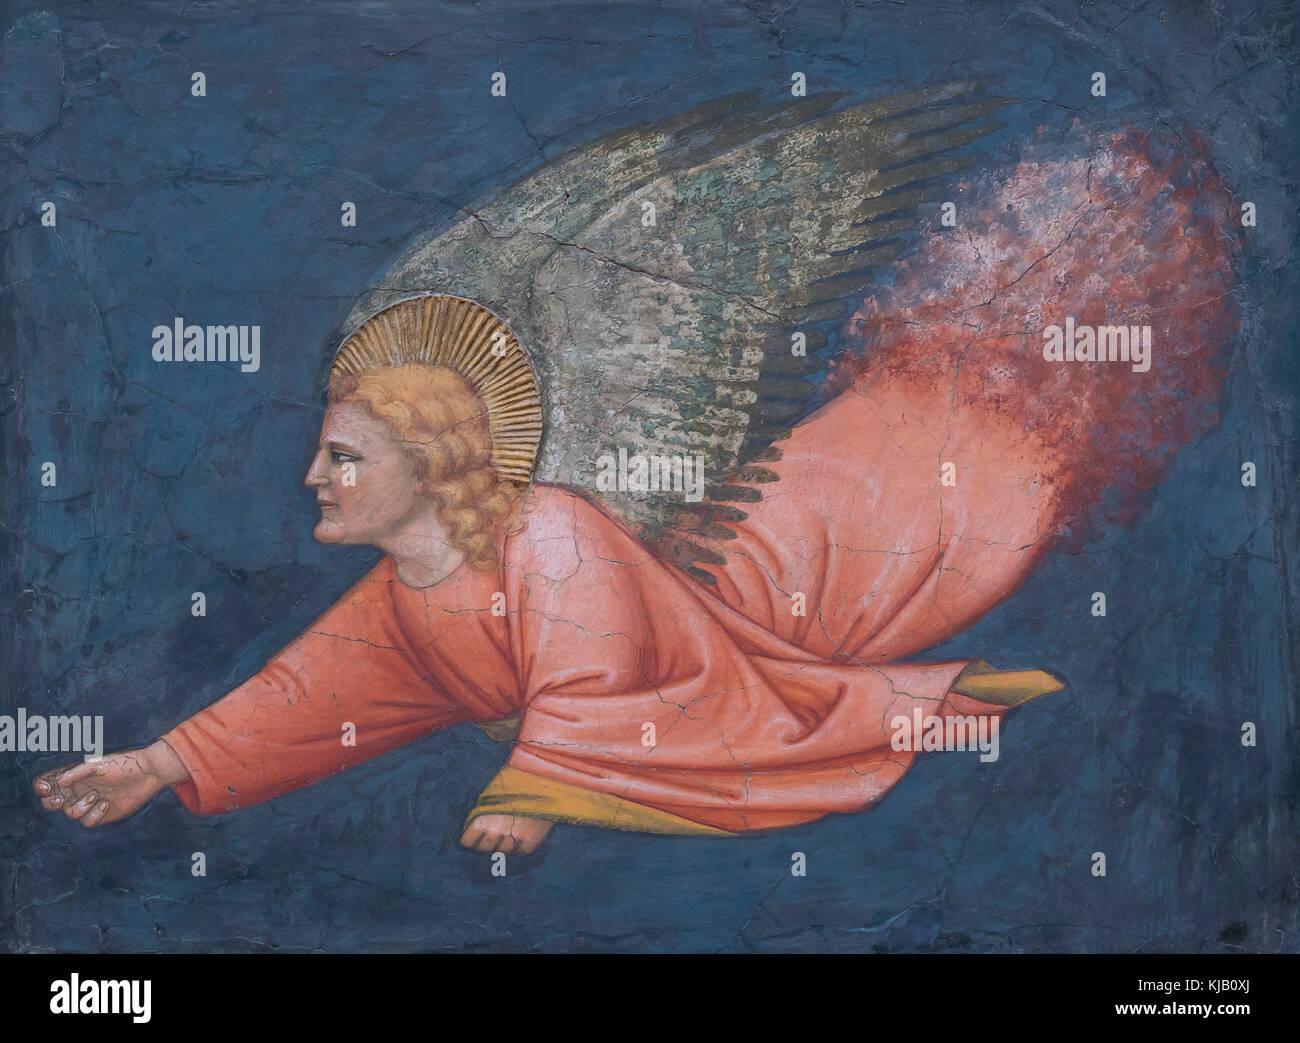 Angel, 14th century, italian, fresco, Metropolitan Museum of Art, Manhattan, New York City, USA, North America - Stock Image